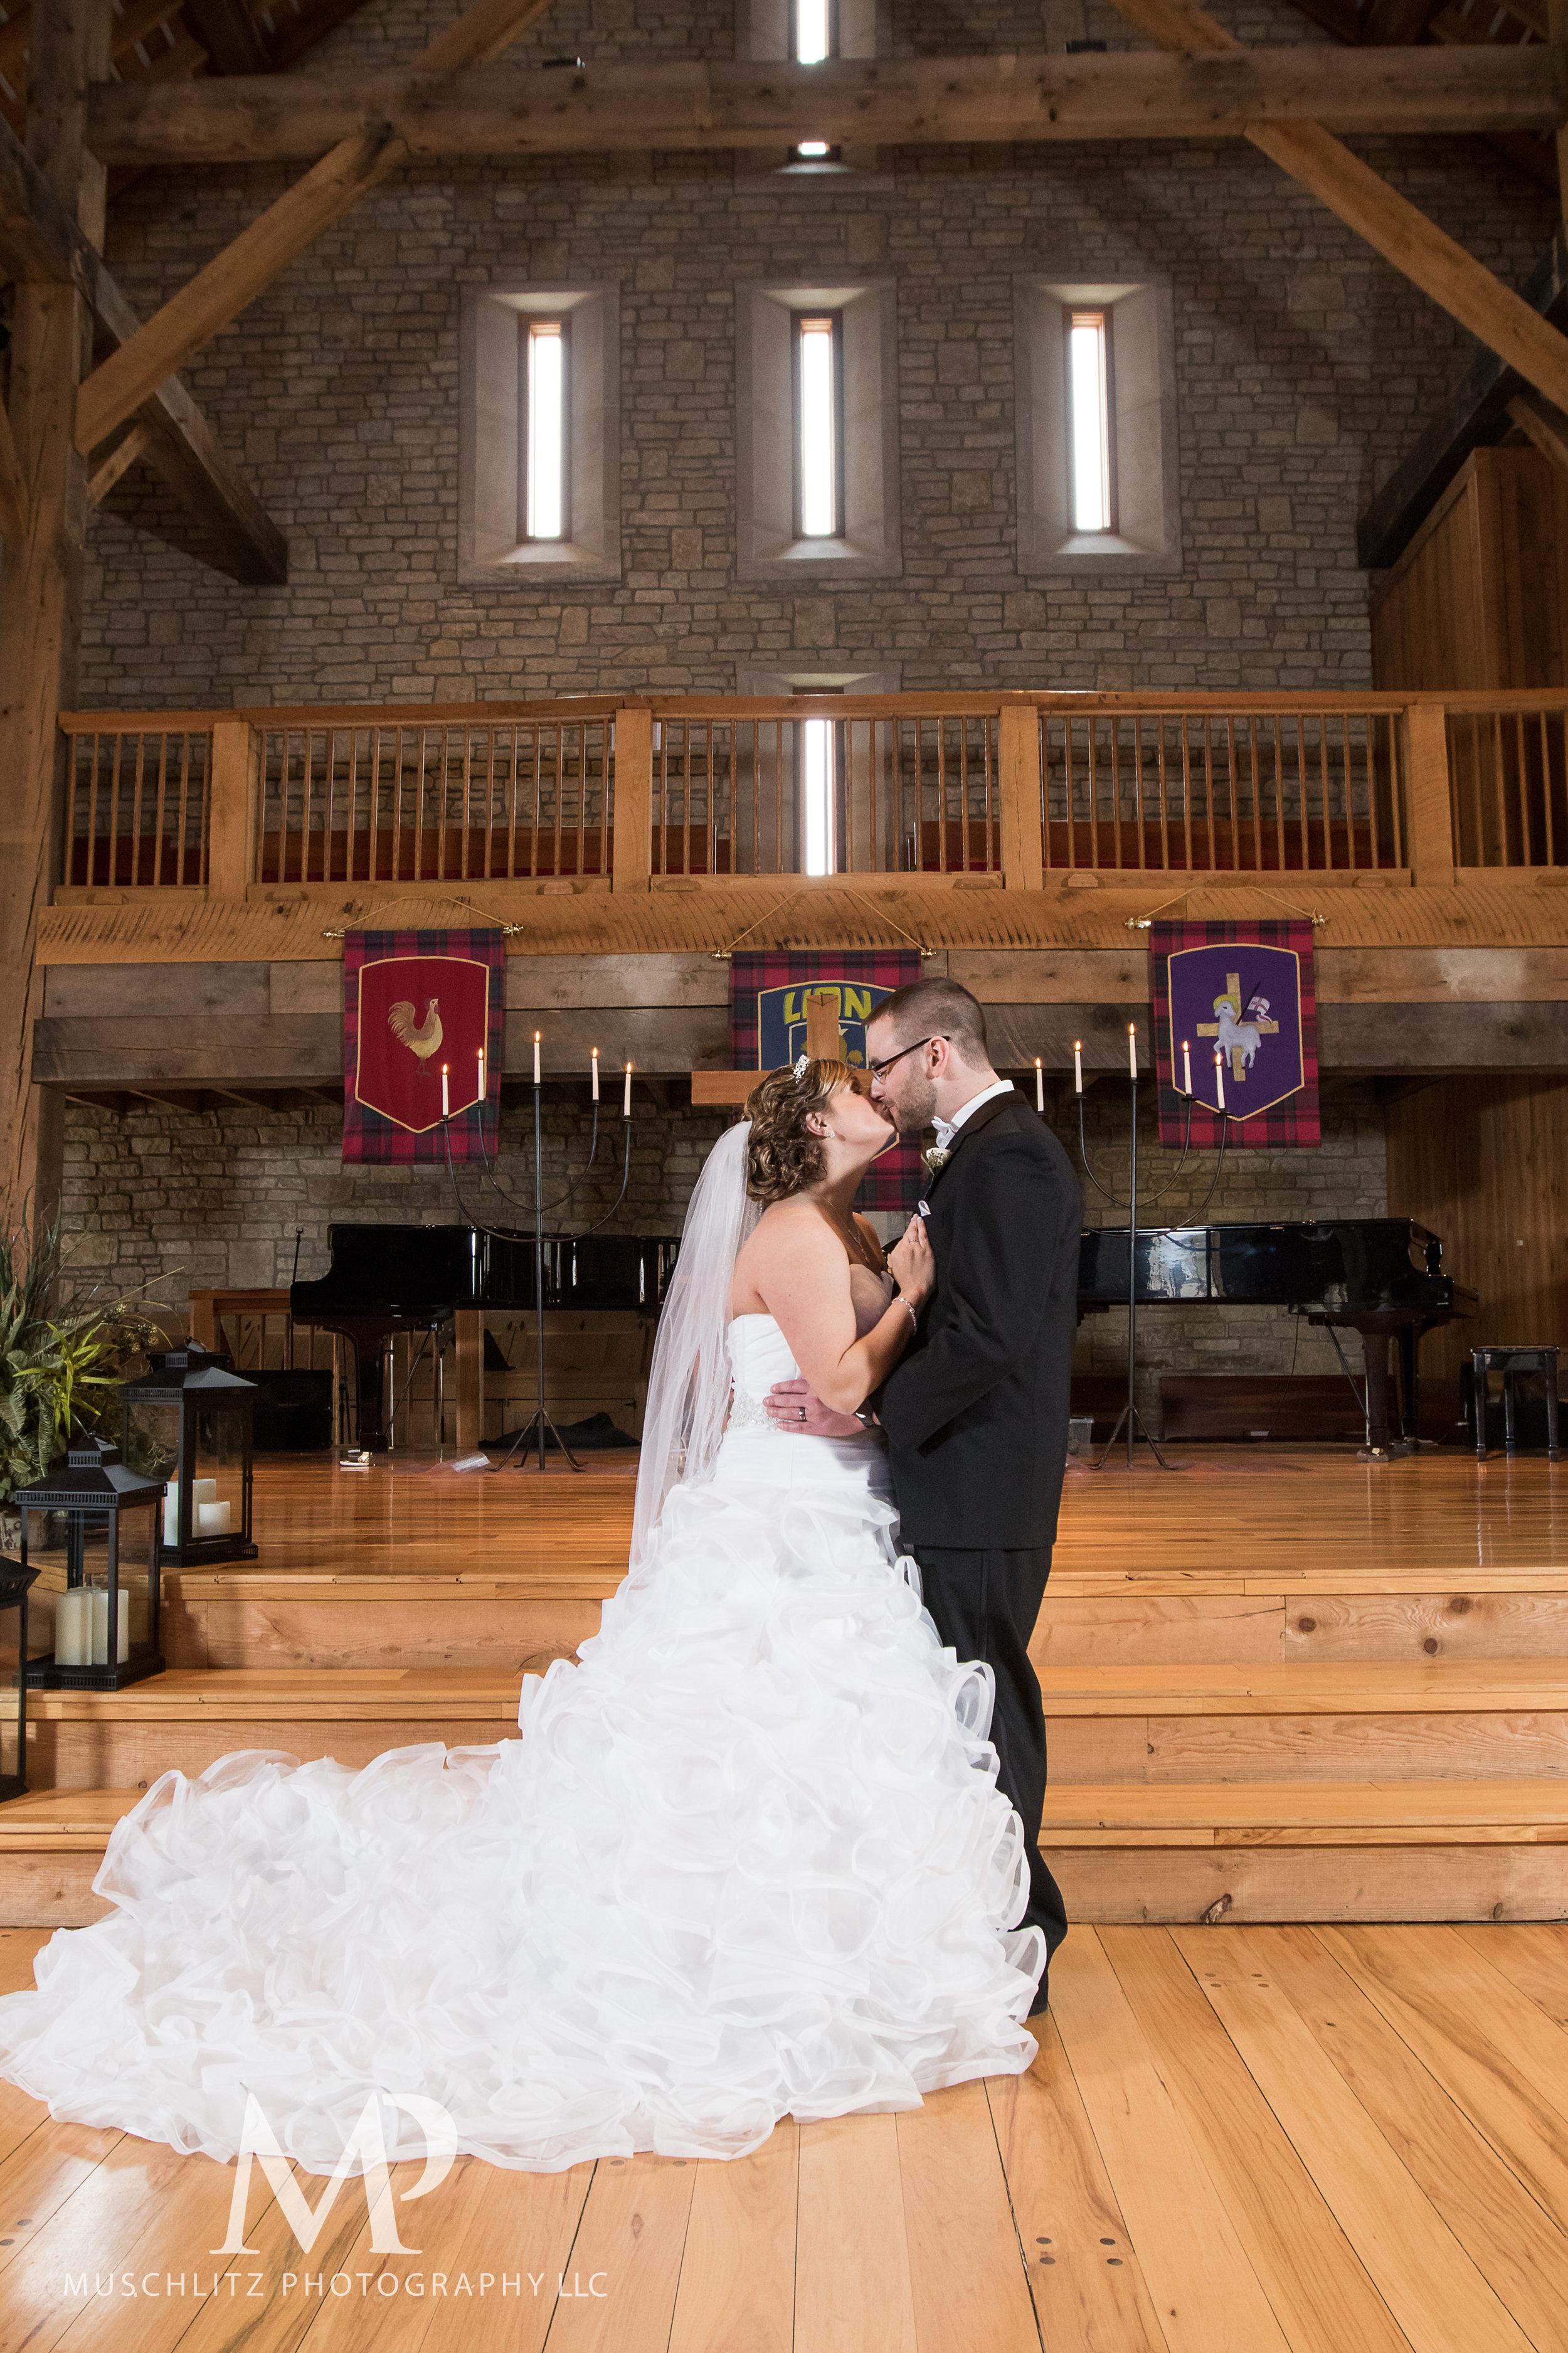 liberty-barn-presbyterian-church-wedding-delaware-columbus-ohio-muschlitz-photography-049.JPG